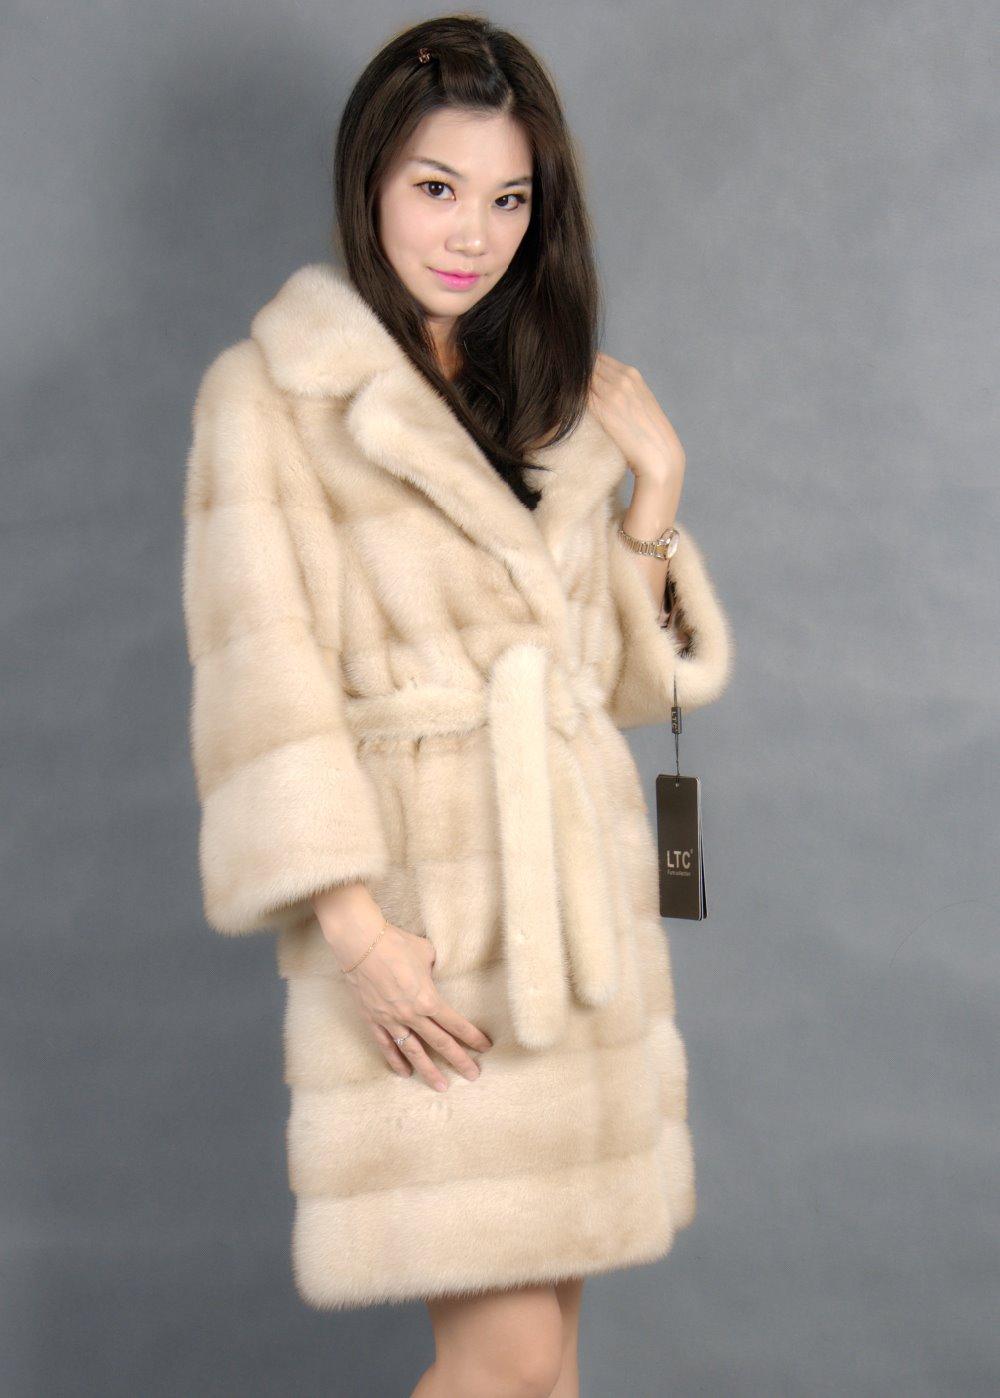 Genuine Mink Fur Coat With  Turn-down Collar Light Color 100% Natural Mink Fur Coa T2019